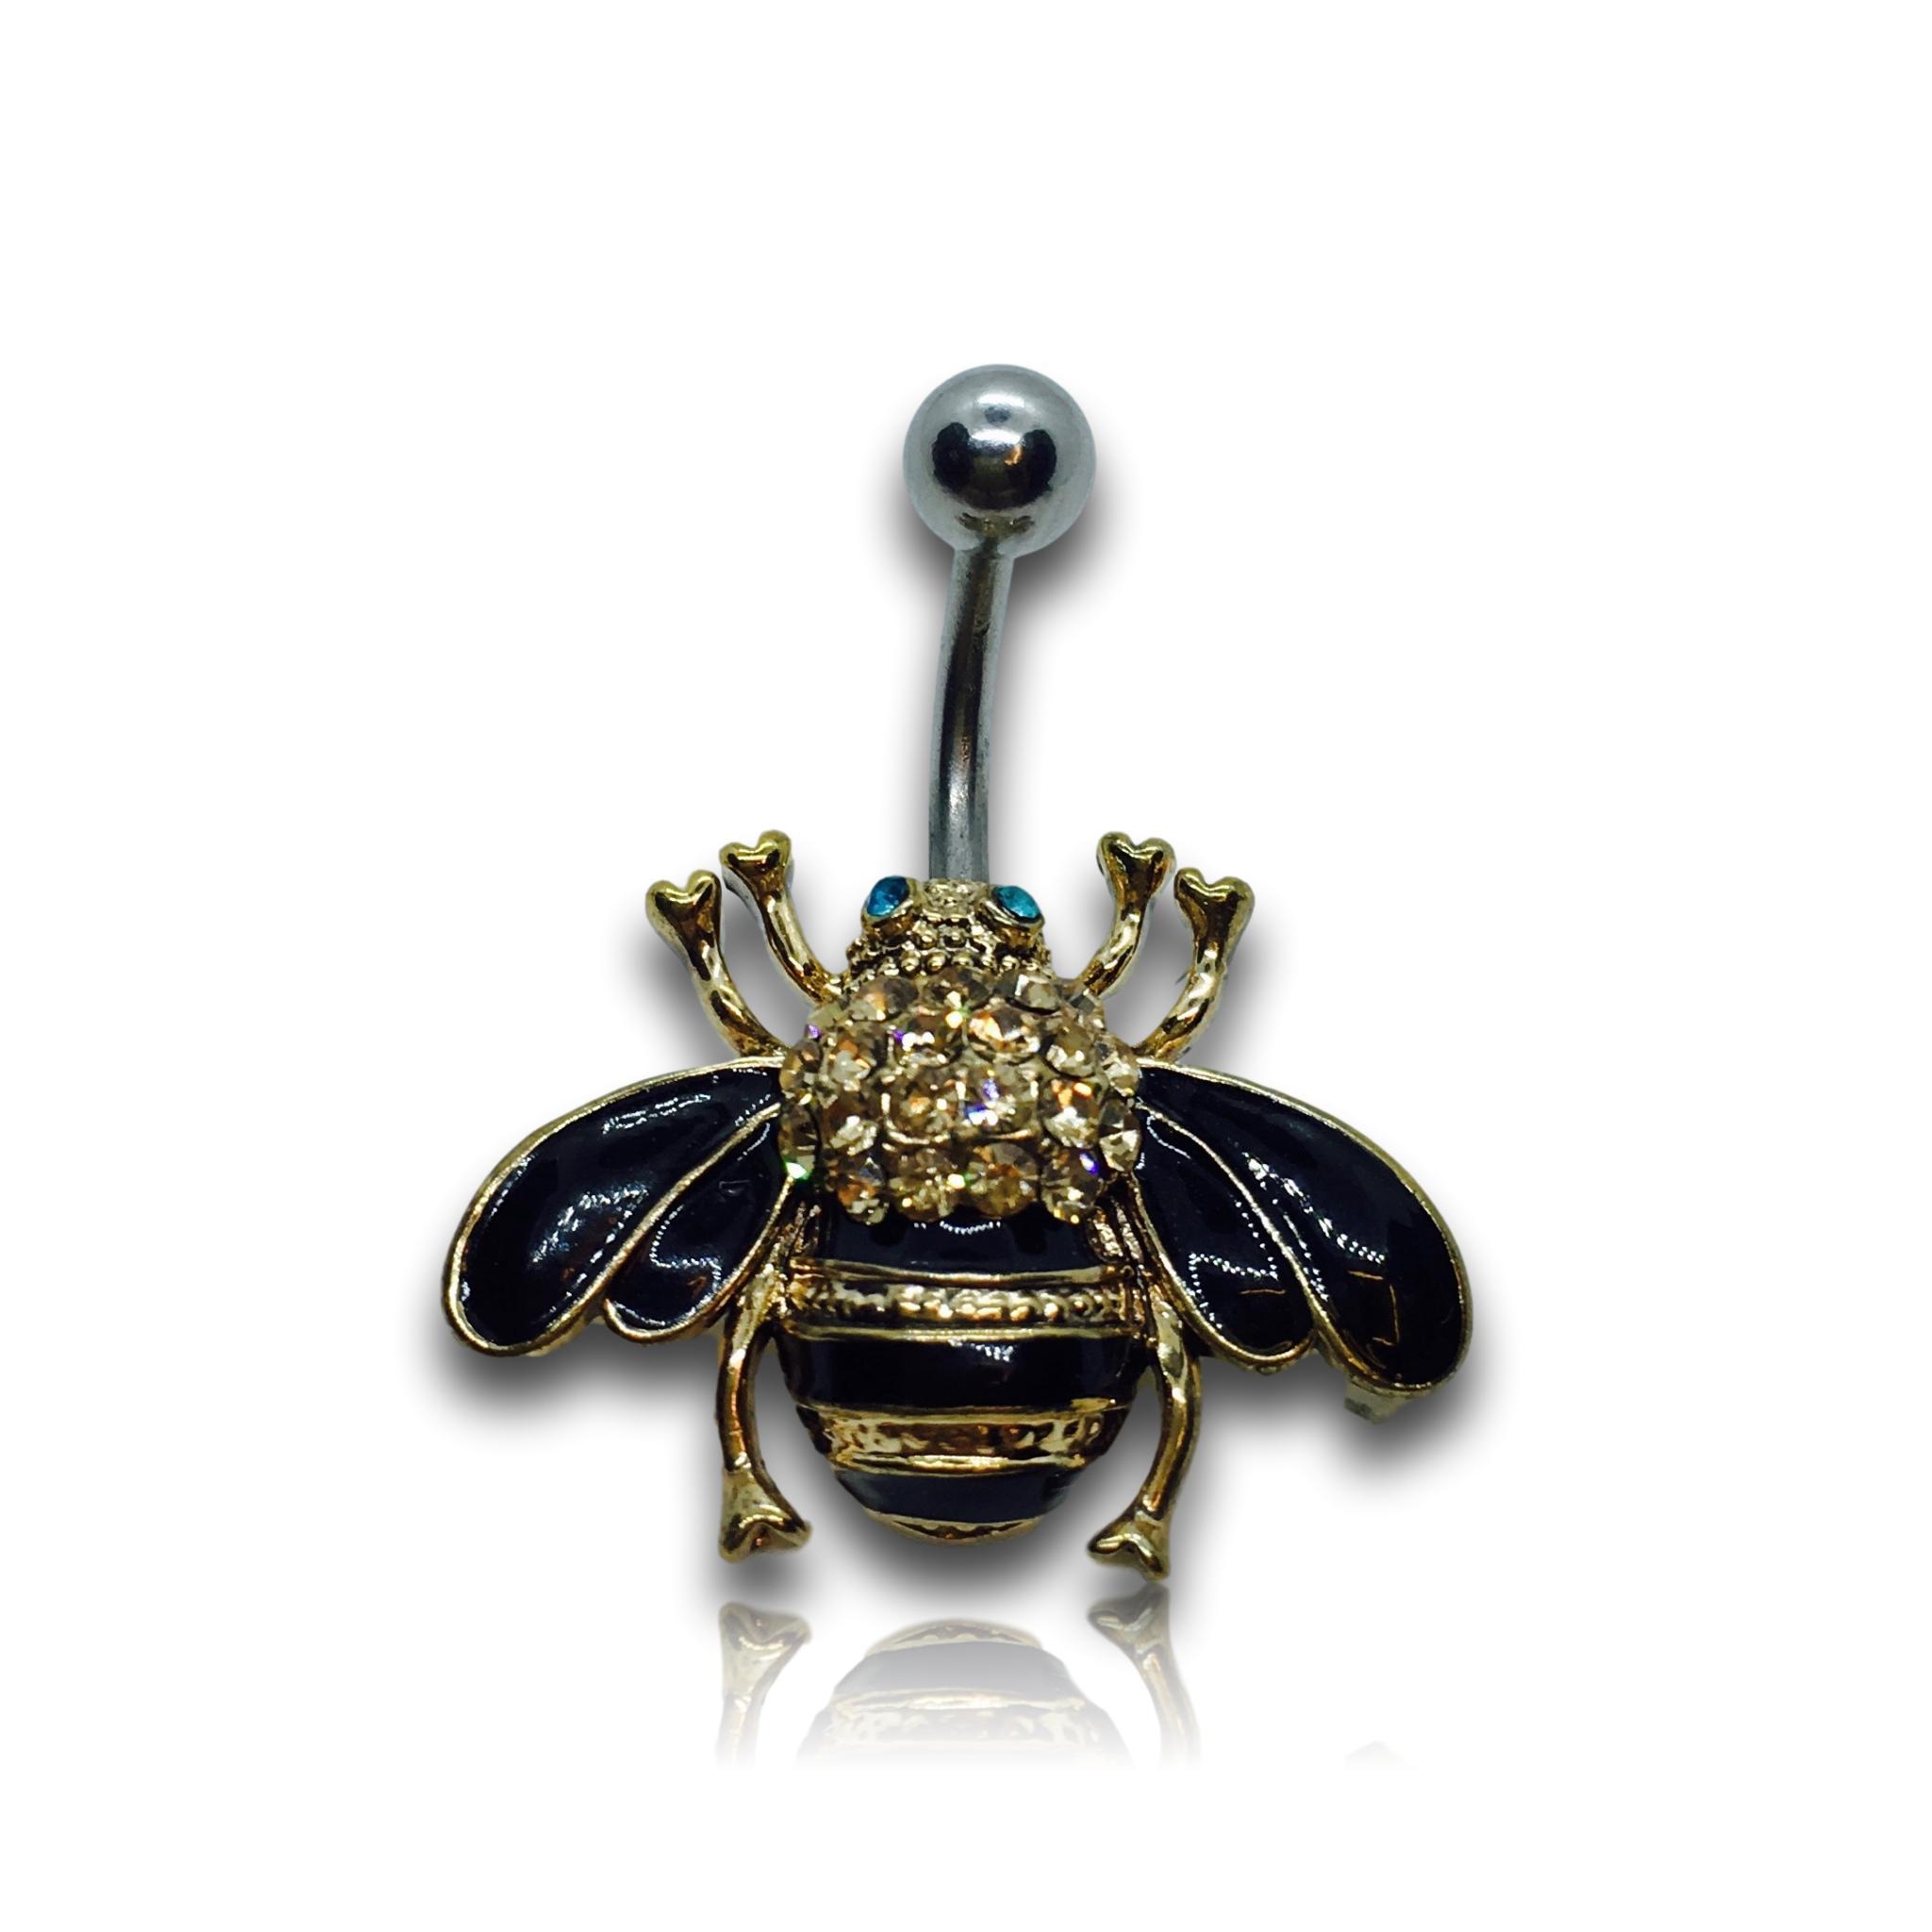 Napakoru, Mehiläinen